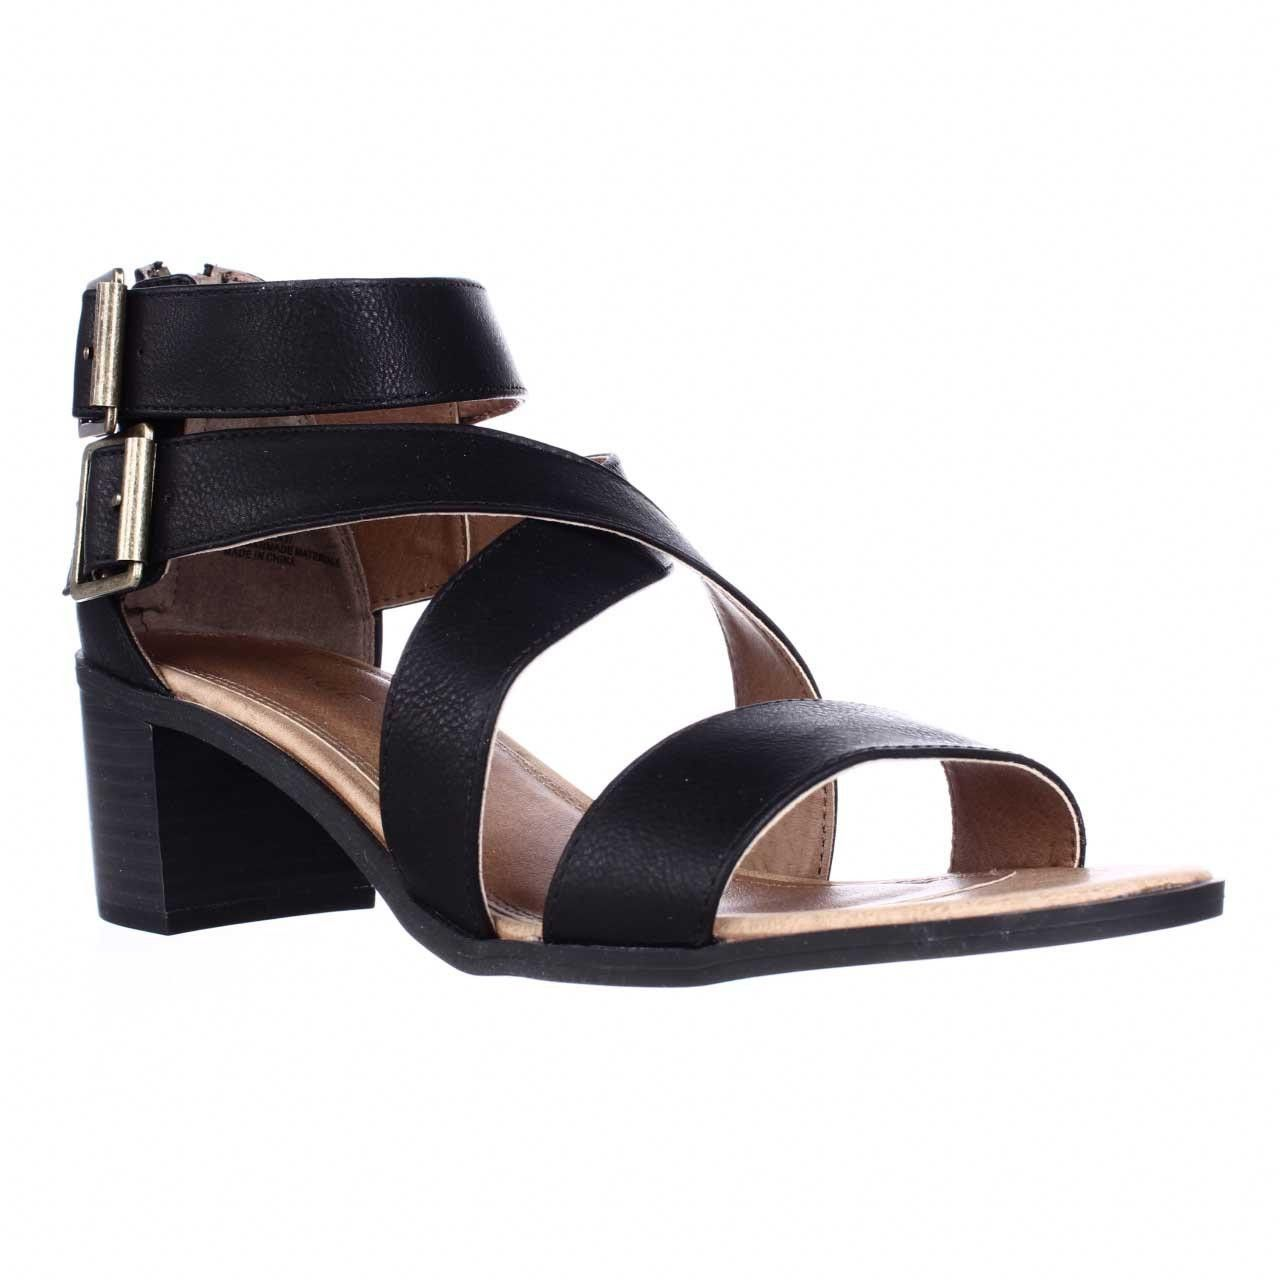 Black leather sandals low heel - Rampage Havarti Low Heel Dress Sandals Black